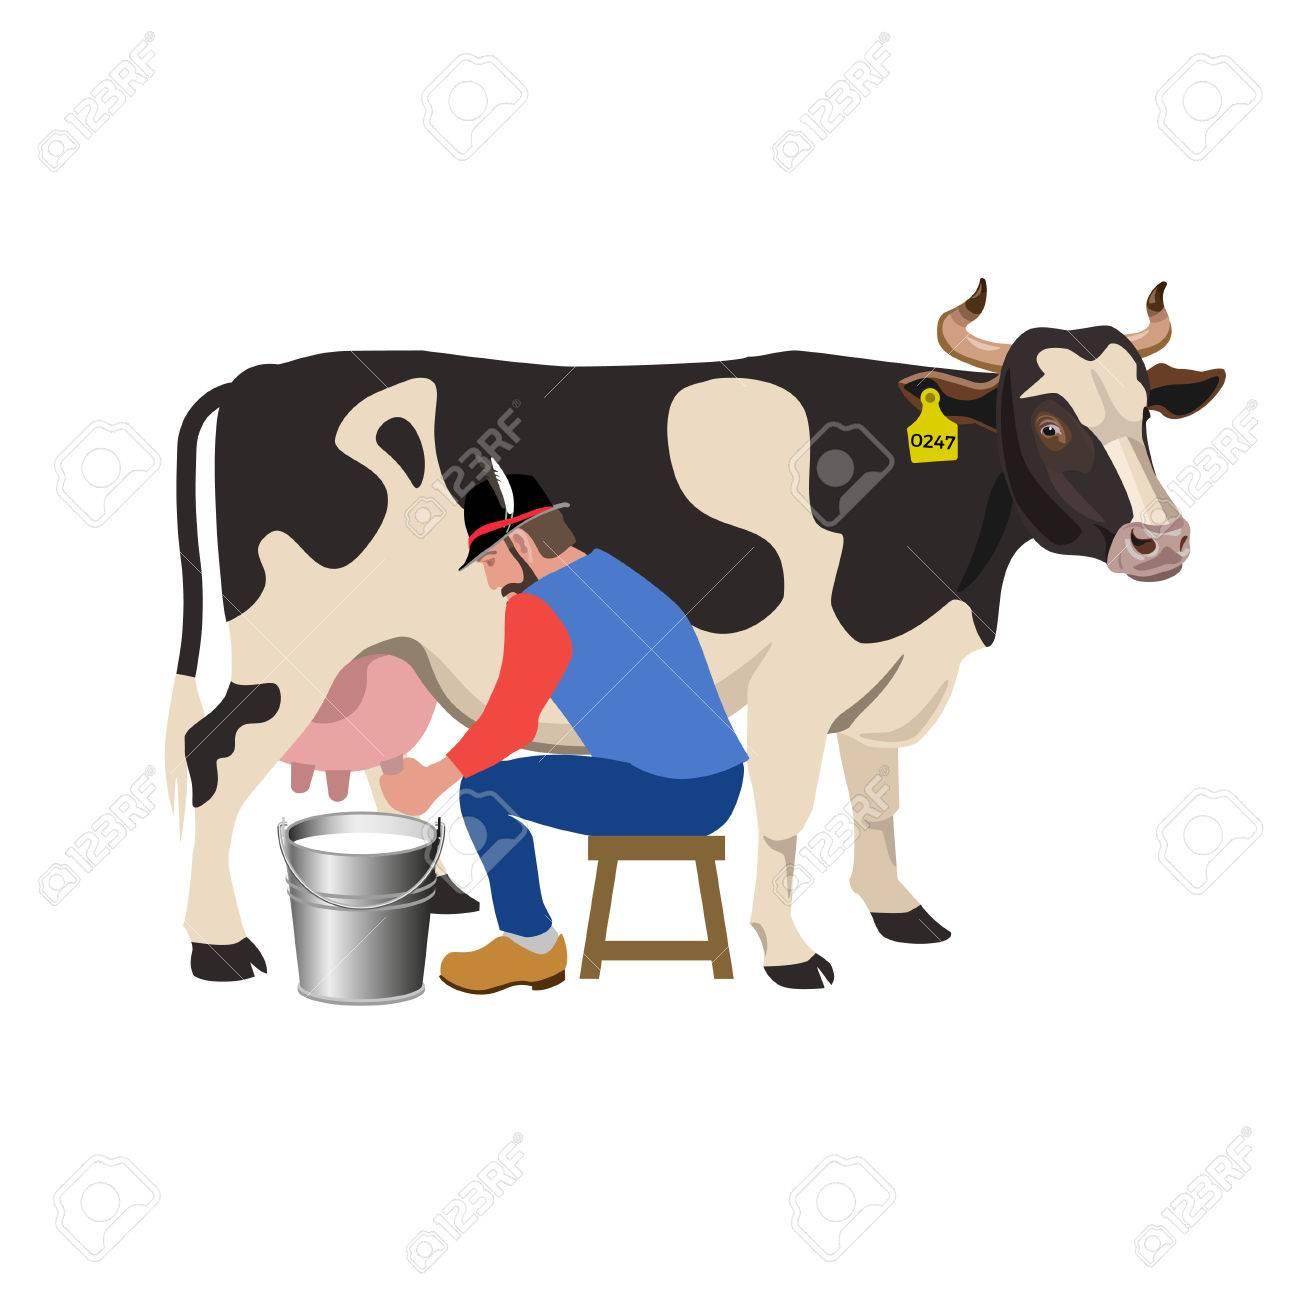 Farmer milking a cow. Vector illustration.